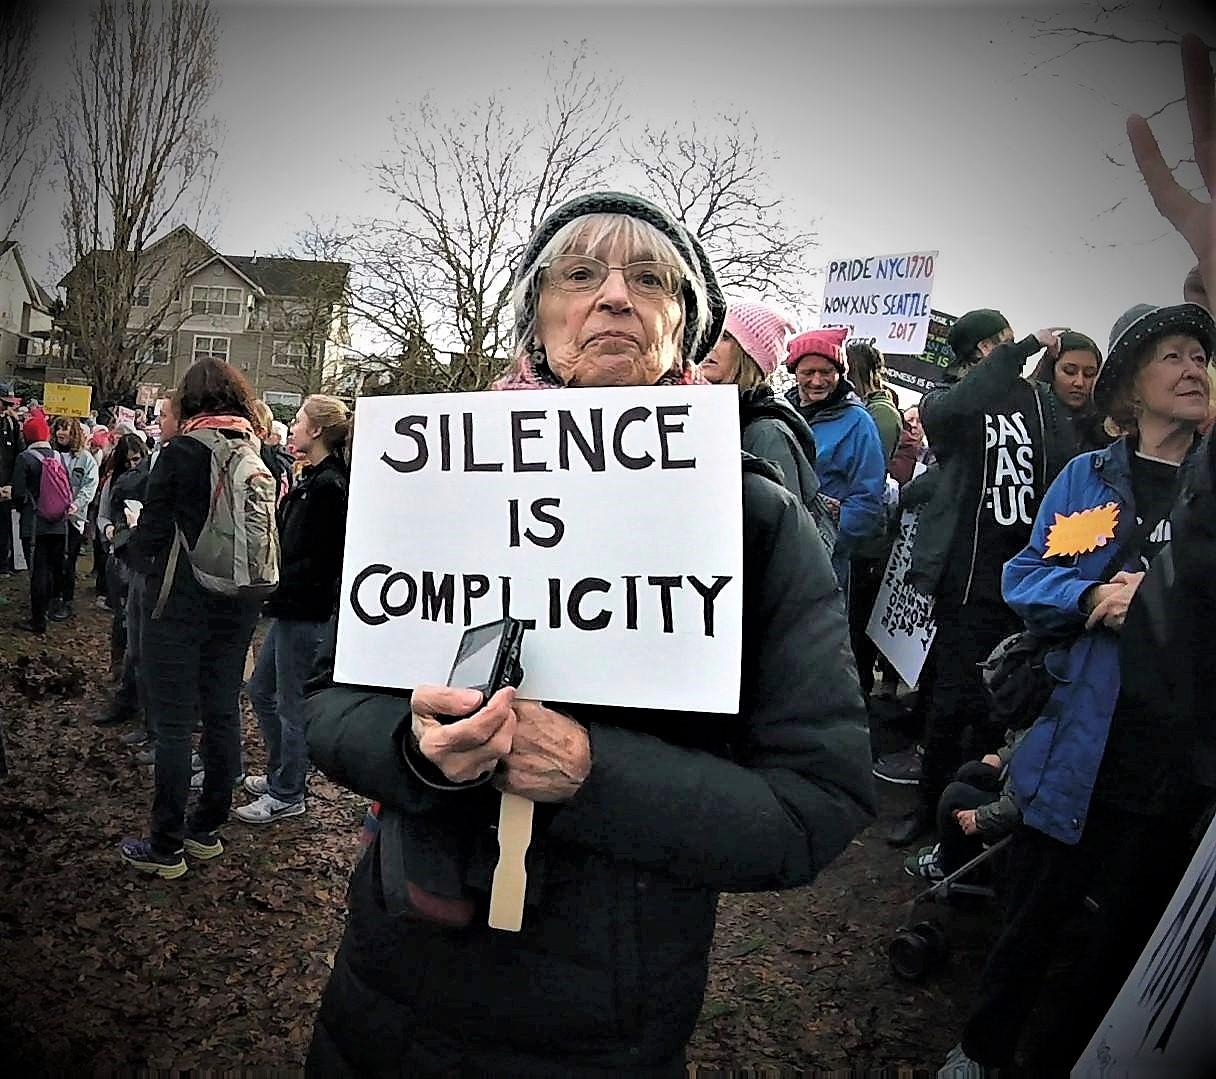 Complicity.jpg